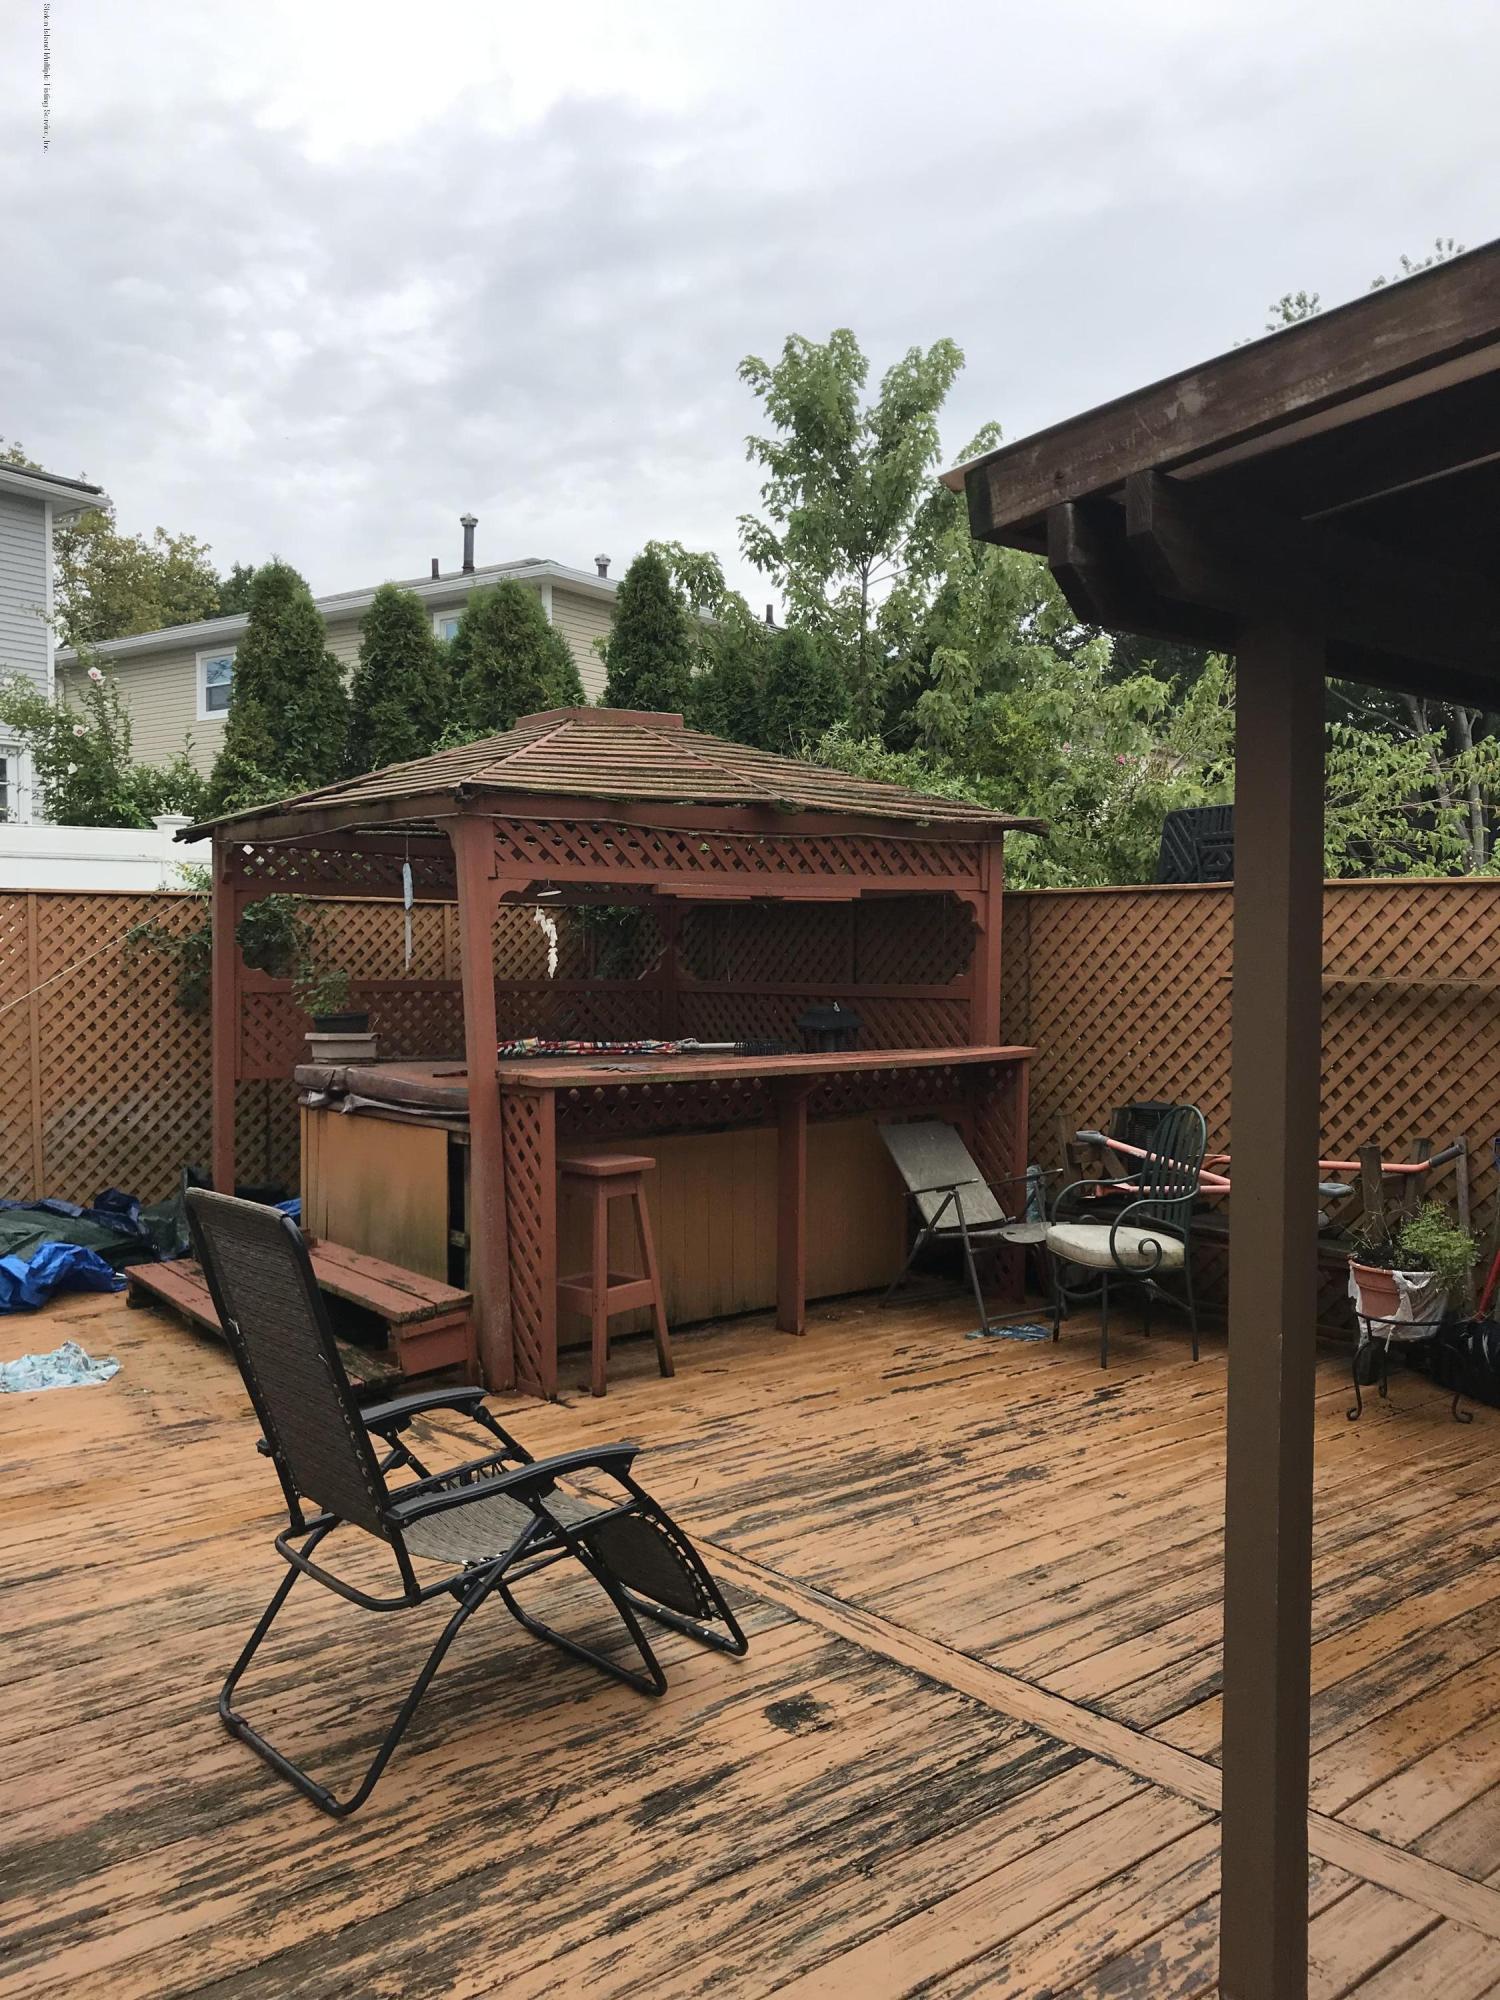 Single Family - Semi-Attached 1097 Arden Avenue  Staten Island, NY 10312, MLS-1131720-7